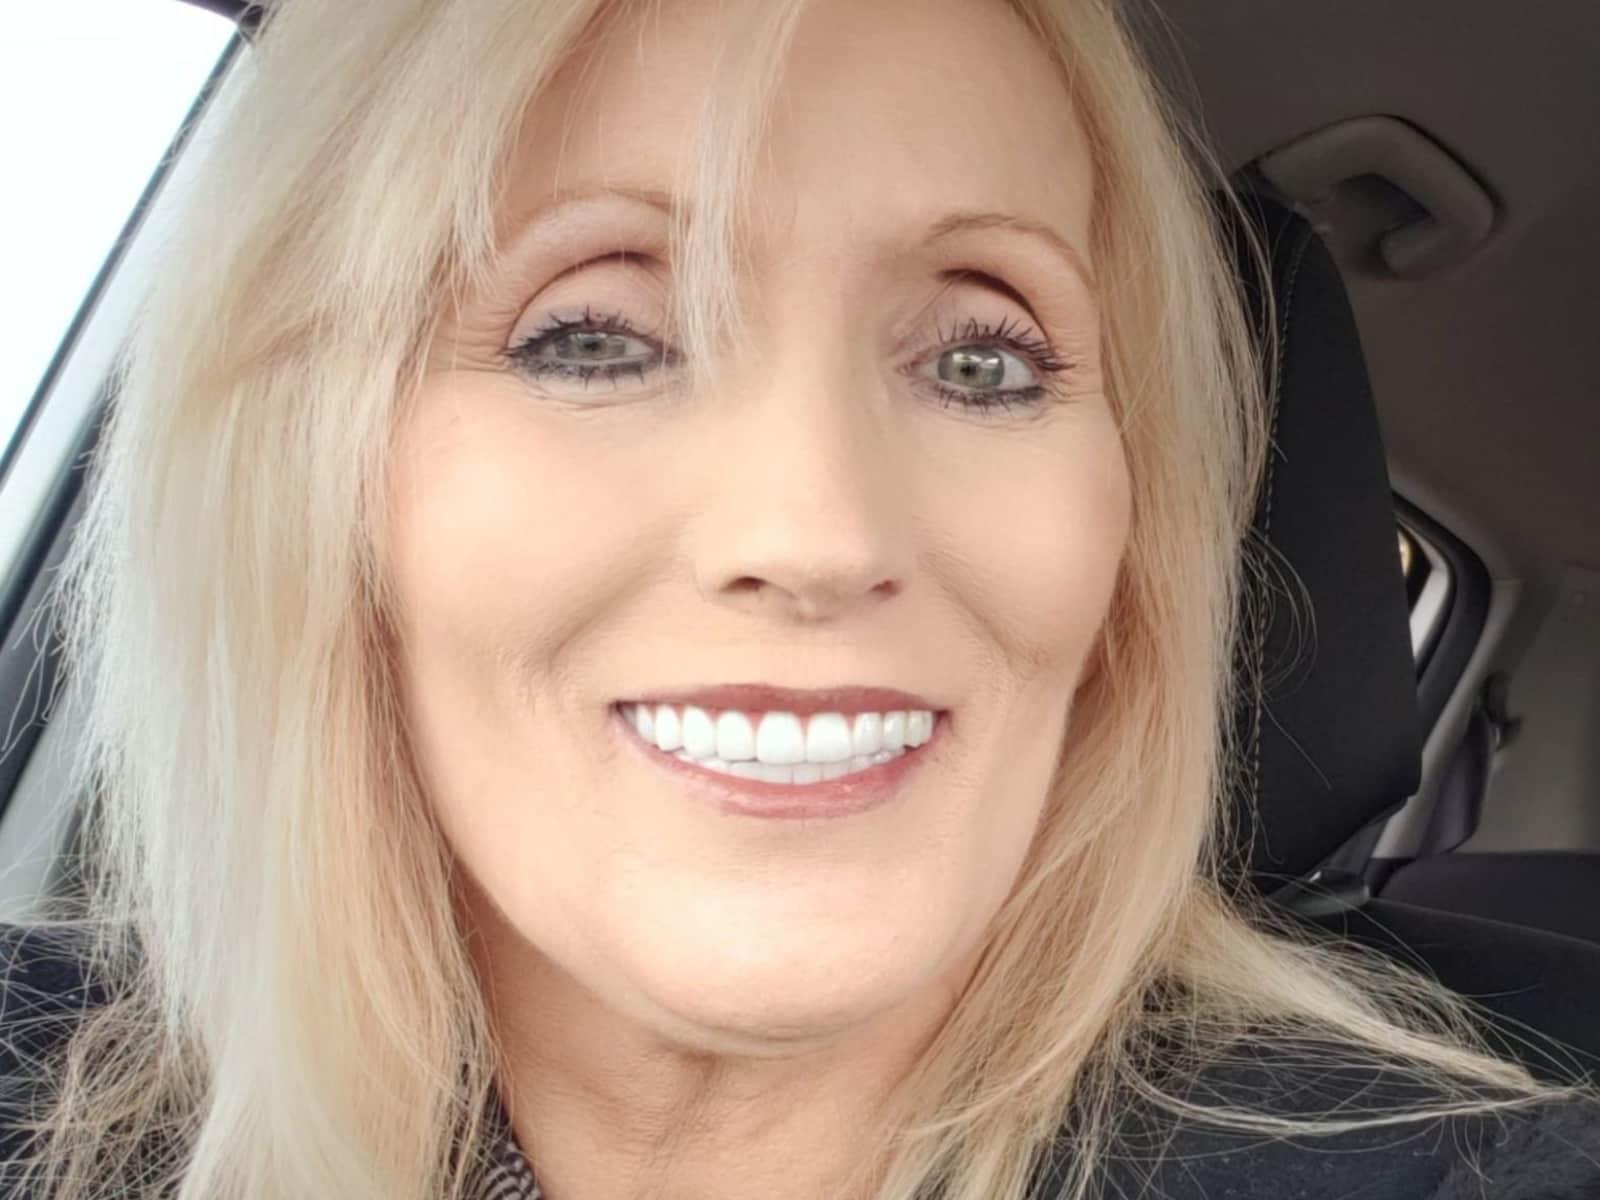 Sherri from Scottsdale, Arizona, United States